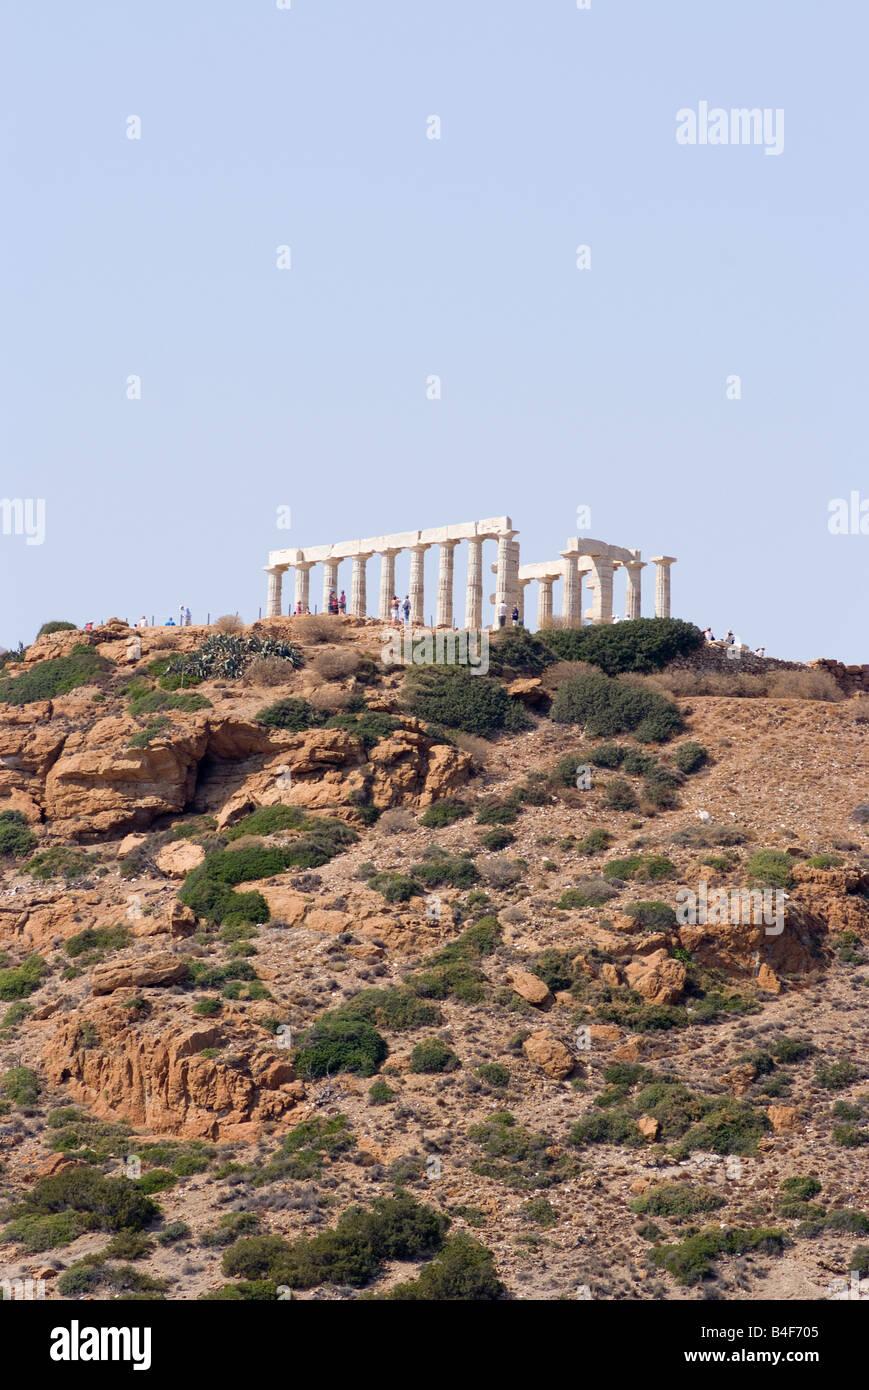 The Temple of Poseidon at Cape Sounion Saronic Gulf Greek Mainland Aegean Greece - Stock Image